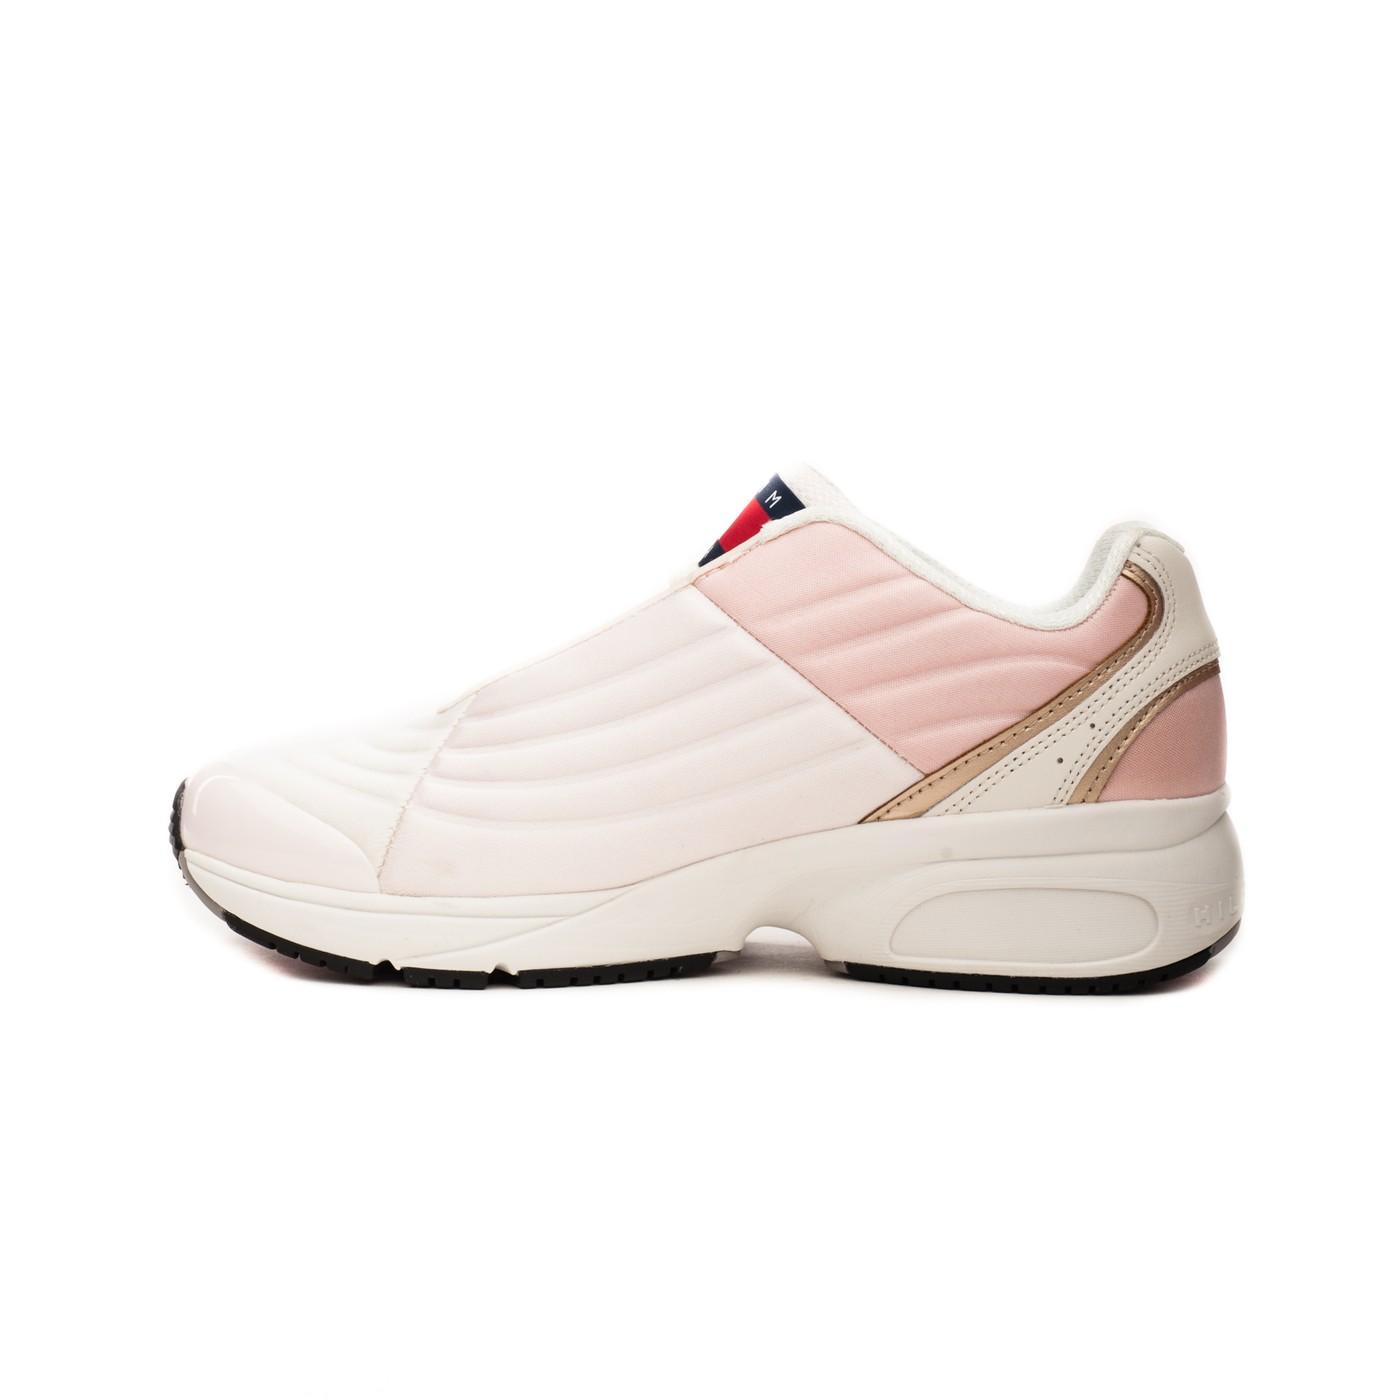 Кросівки жіночі Tommy Hilfiger HERITAGE